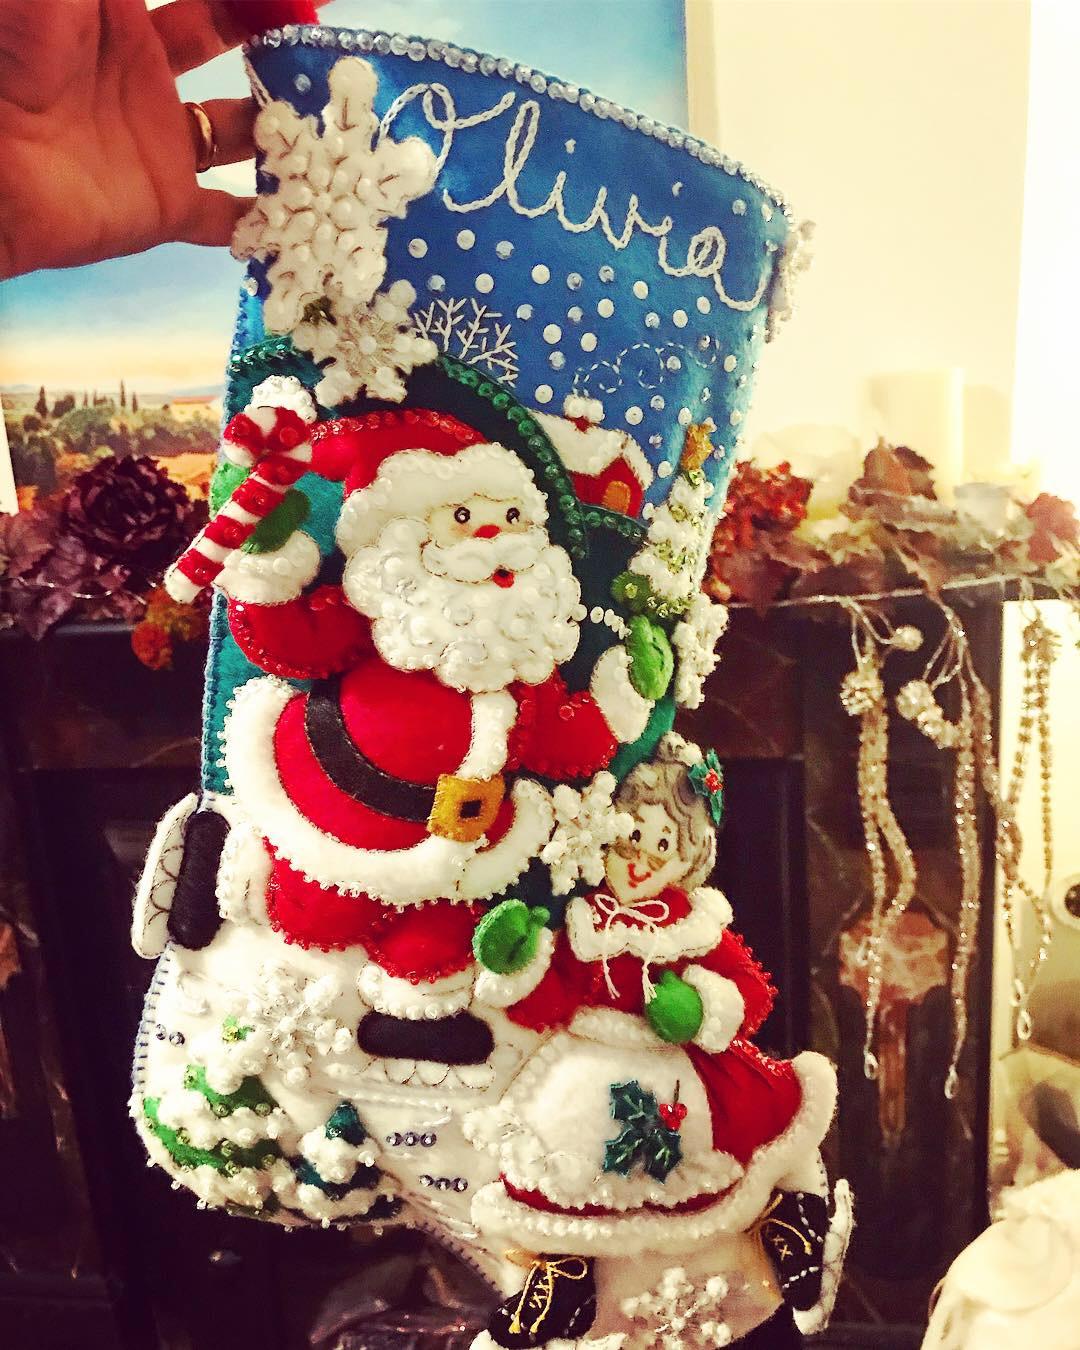 Embroidered Christmas stocking